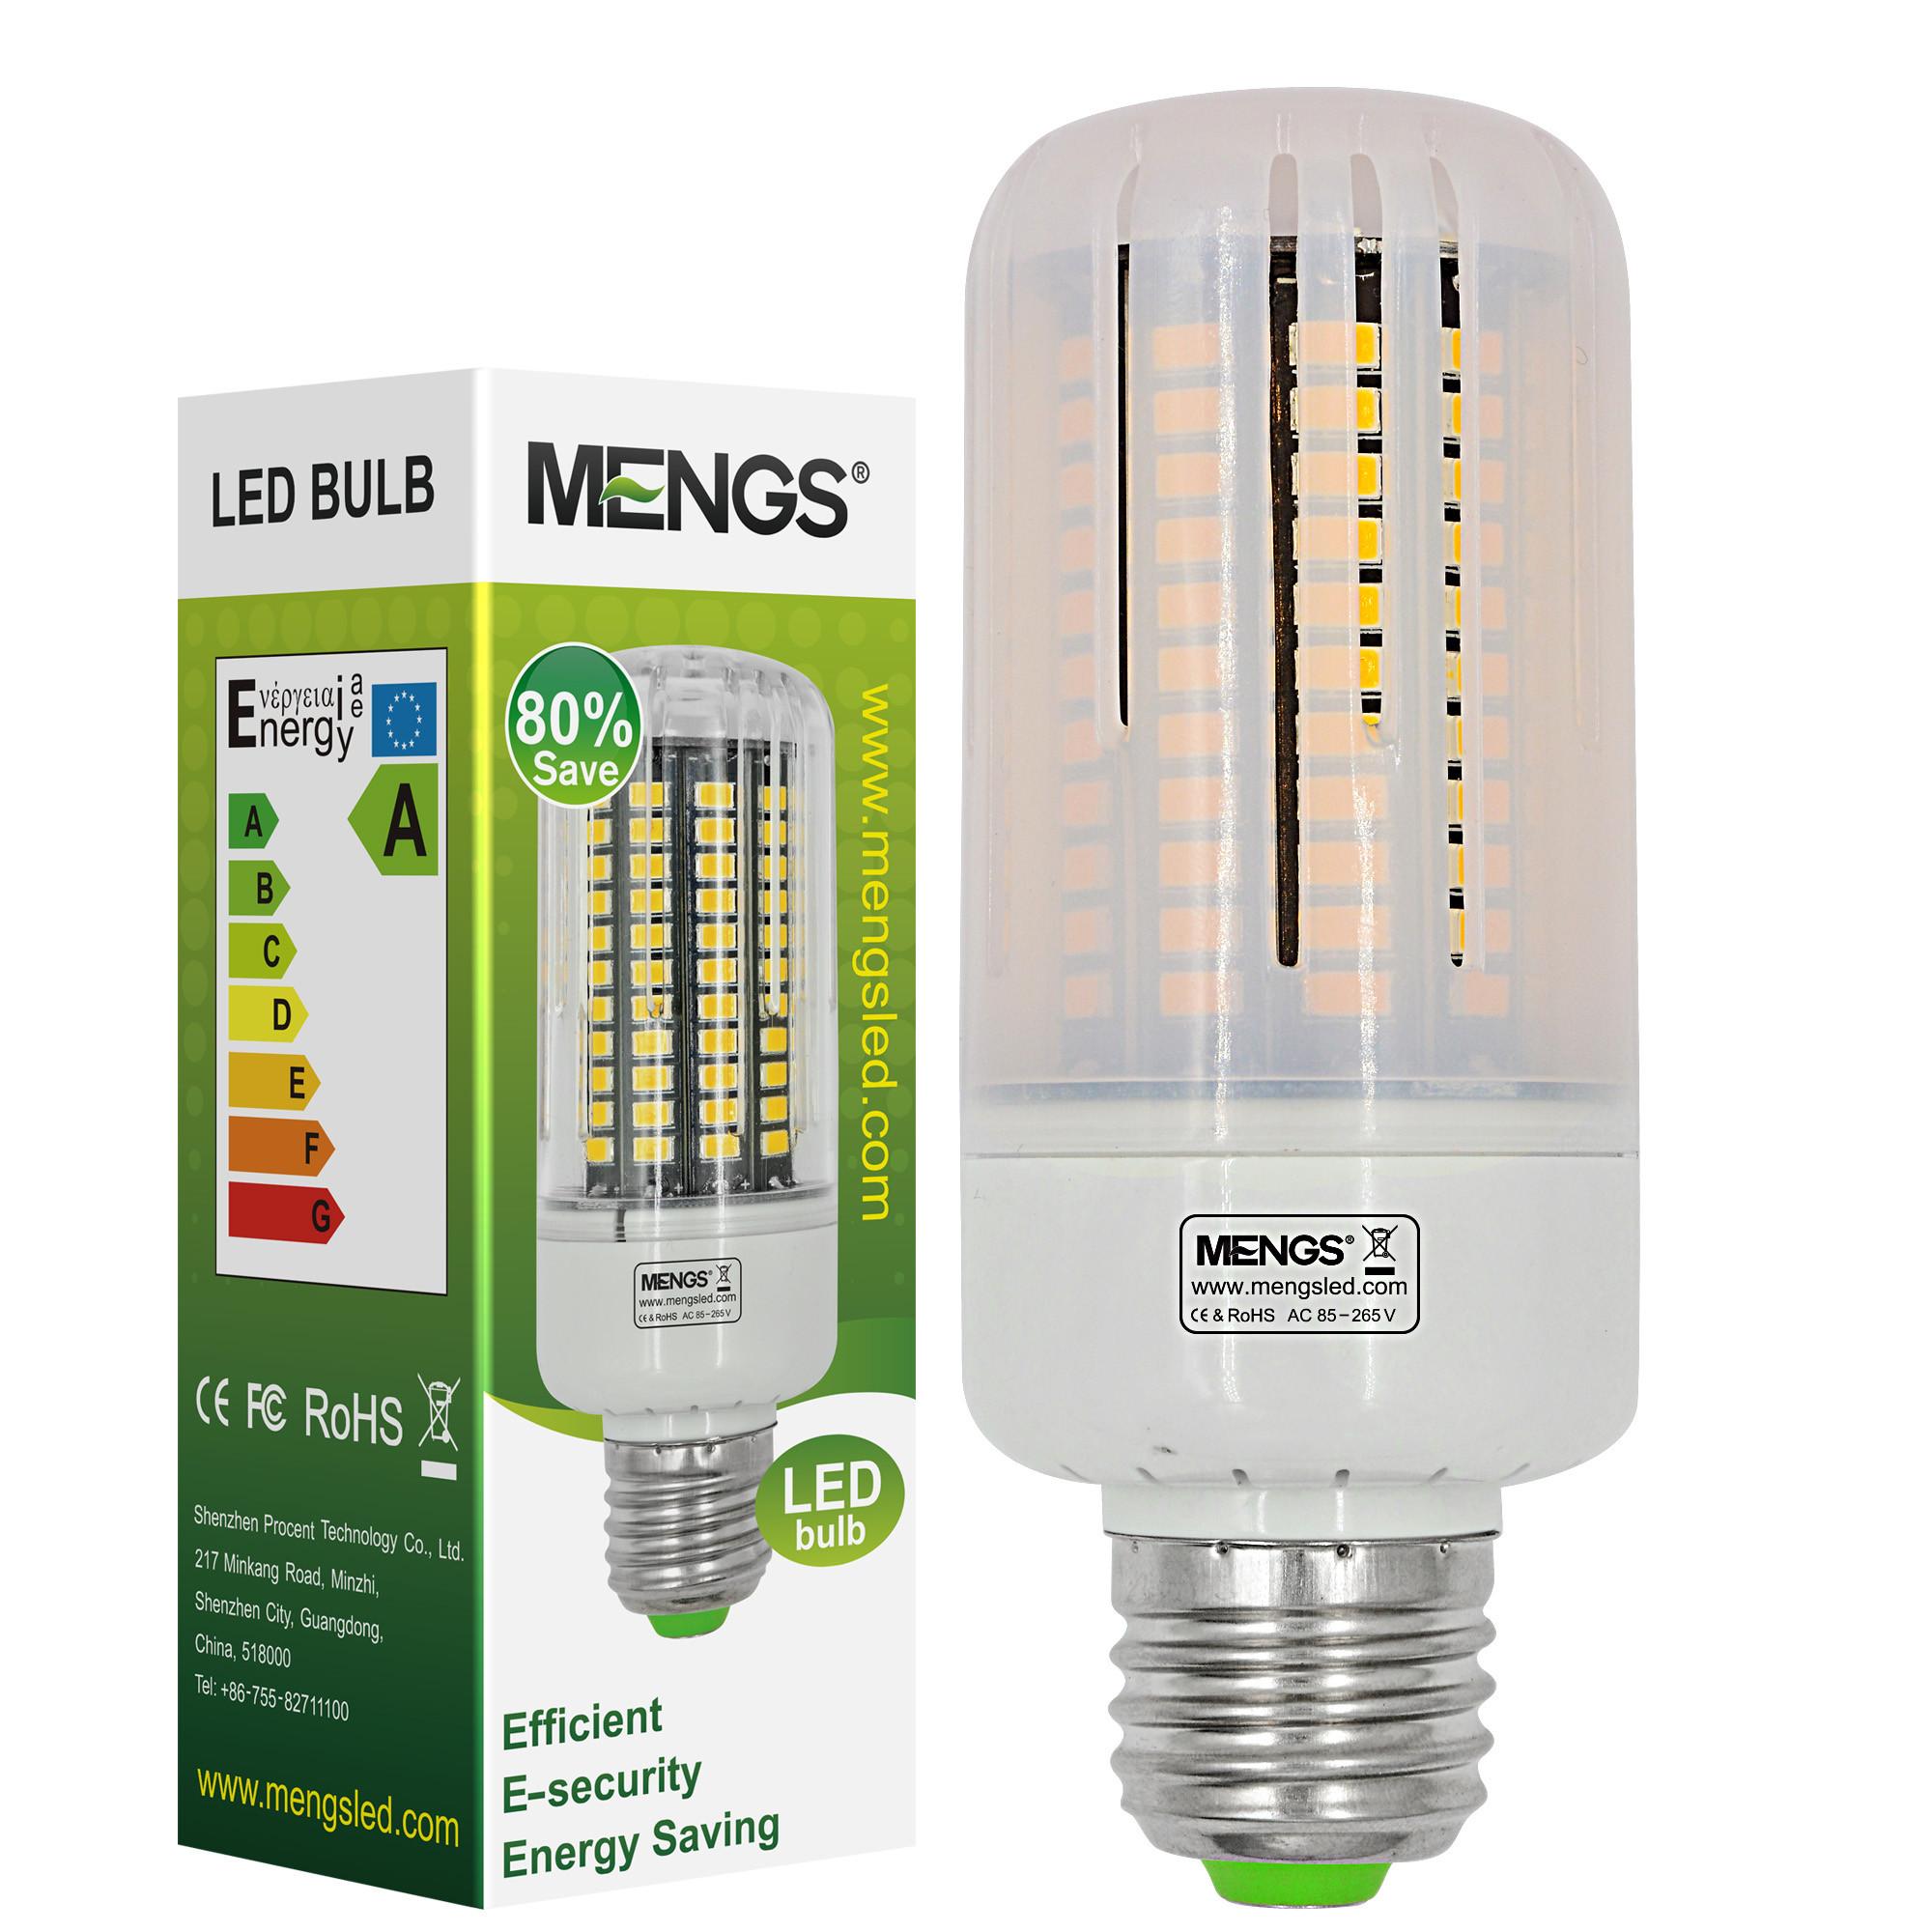 MENGS® Anti-Strobe E27 18W LED Corn Light 130x 5736 SMD LB LED Bulb Lamp In Warm White Energy-Saving Lamp